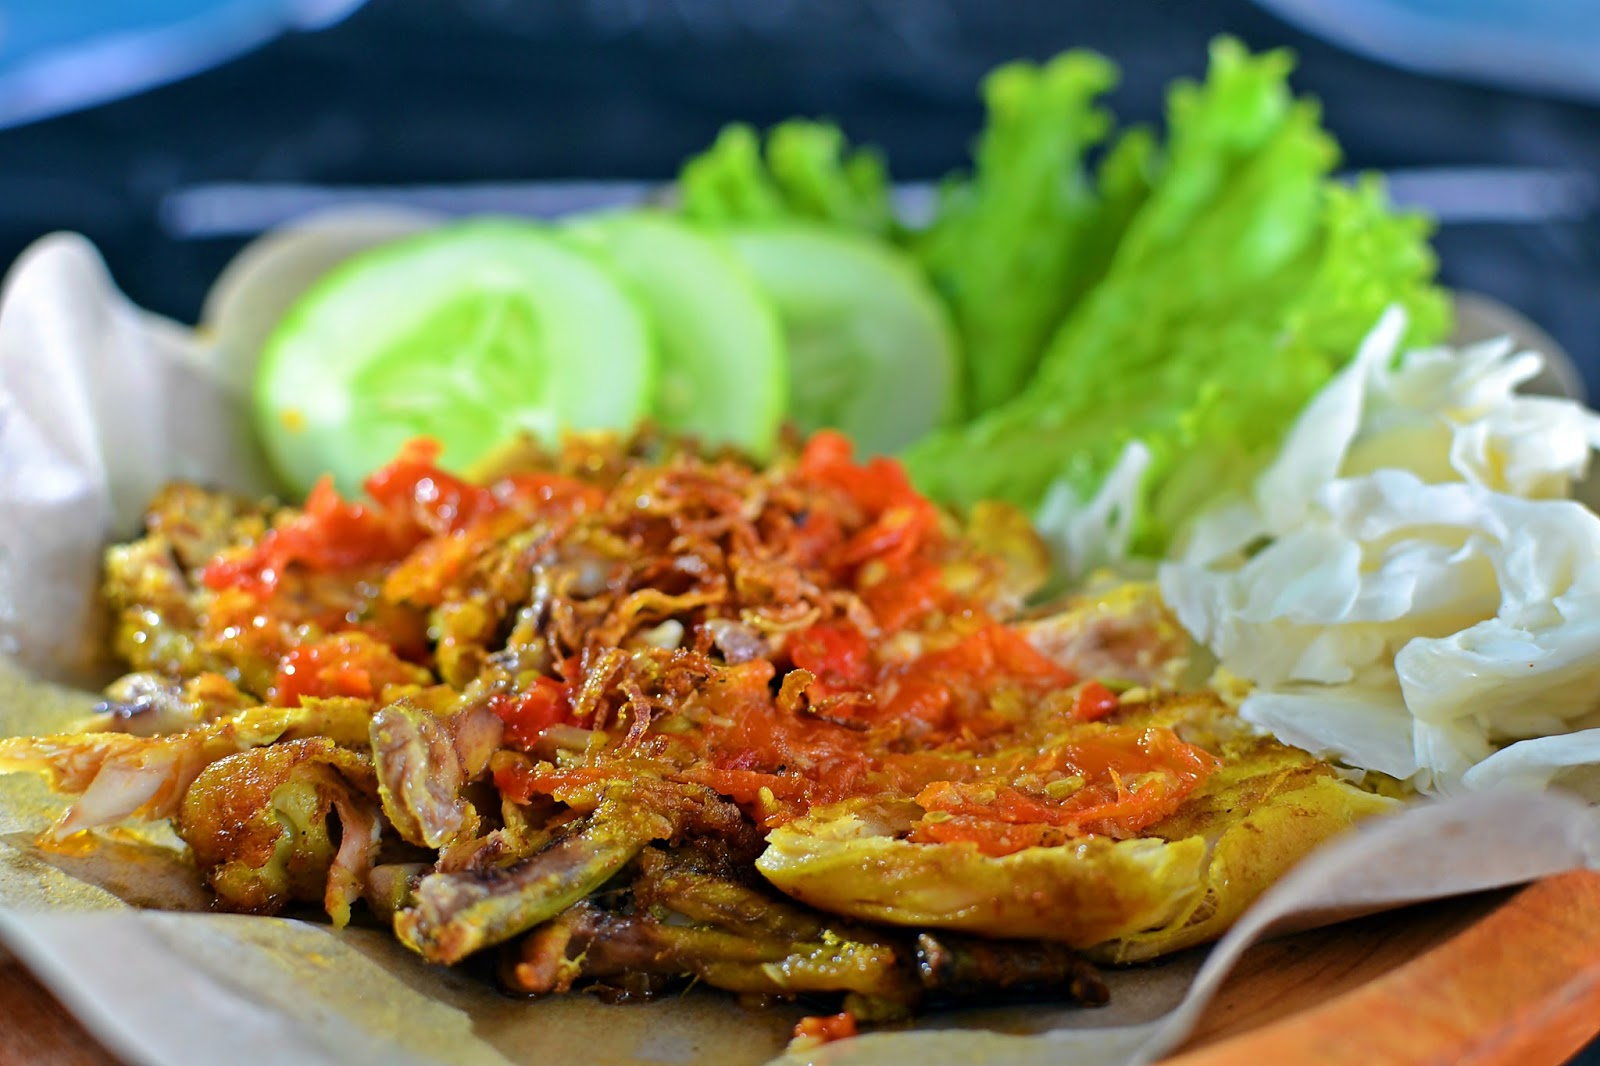 Resep Ayam Penyet Sambal Bawang Pedasnya Mantap - TIKTAK.ID